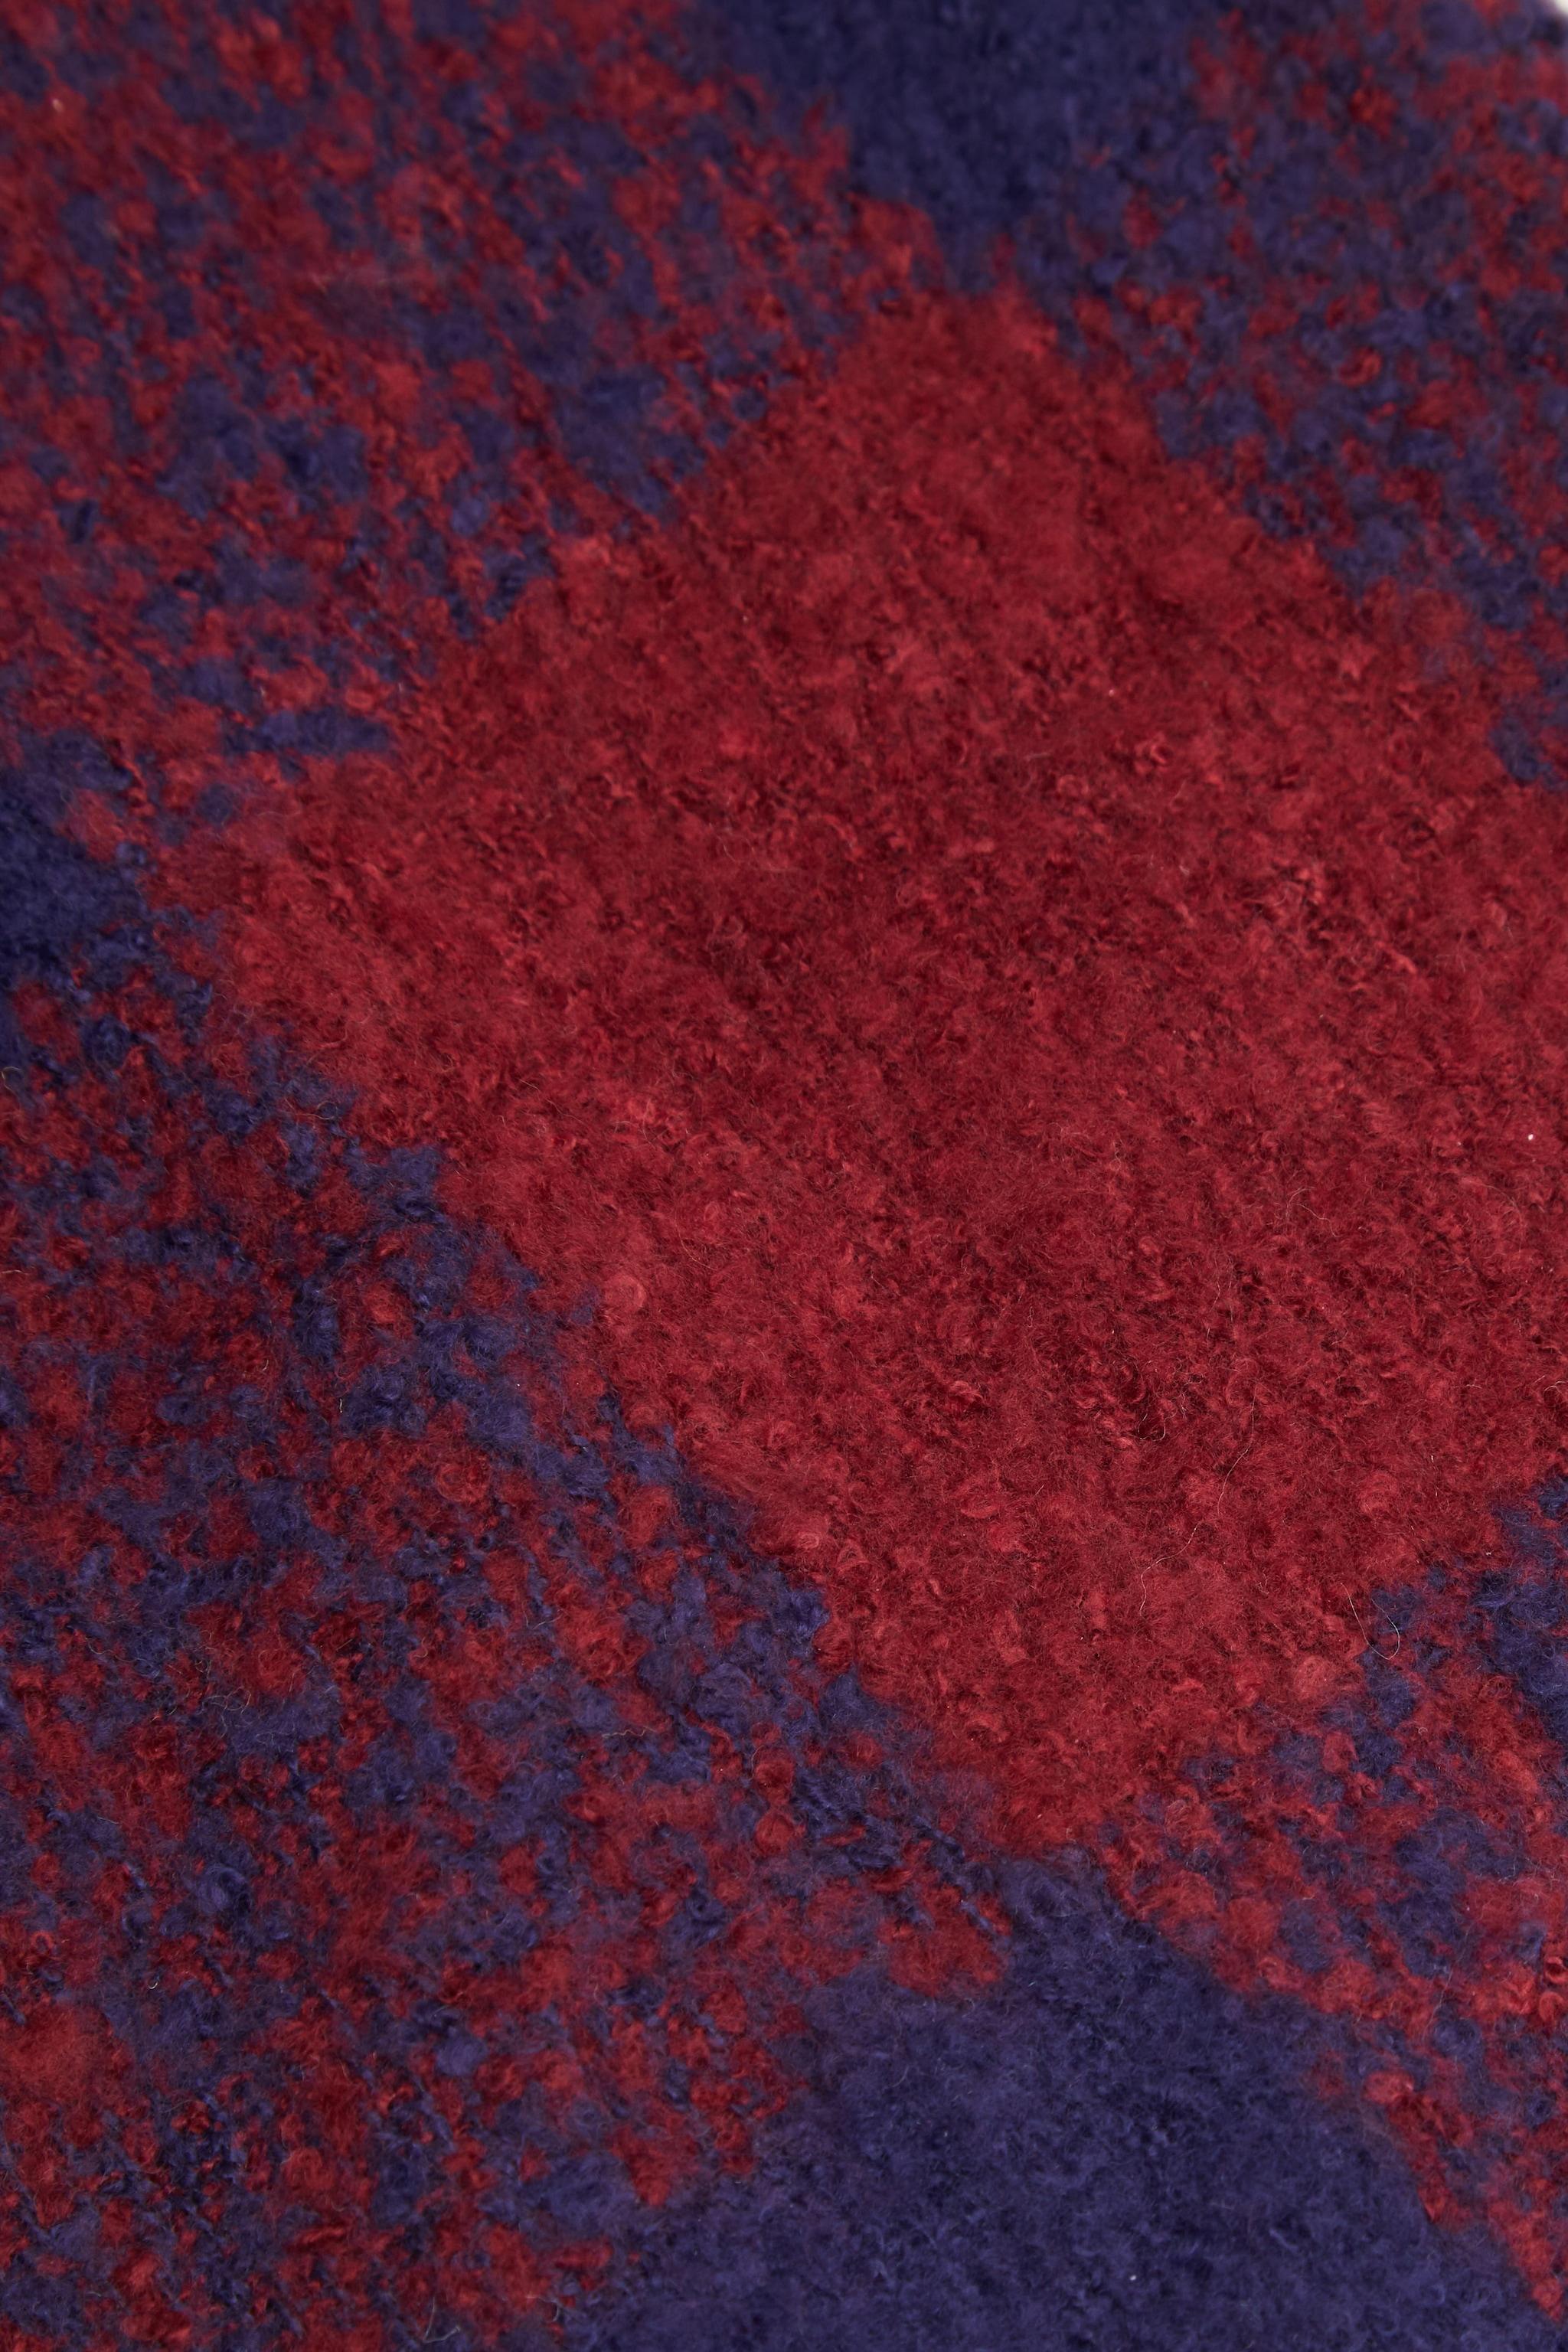 Burgundy And Navy Check Blanket Tassel Scarf 3